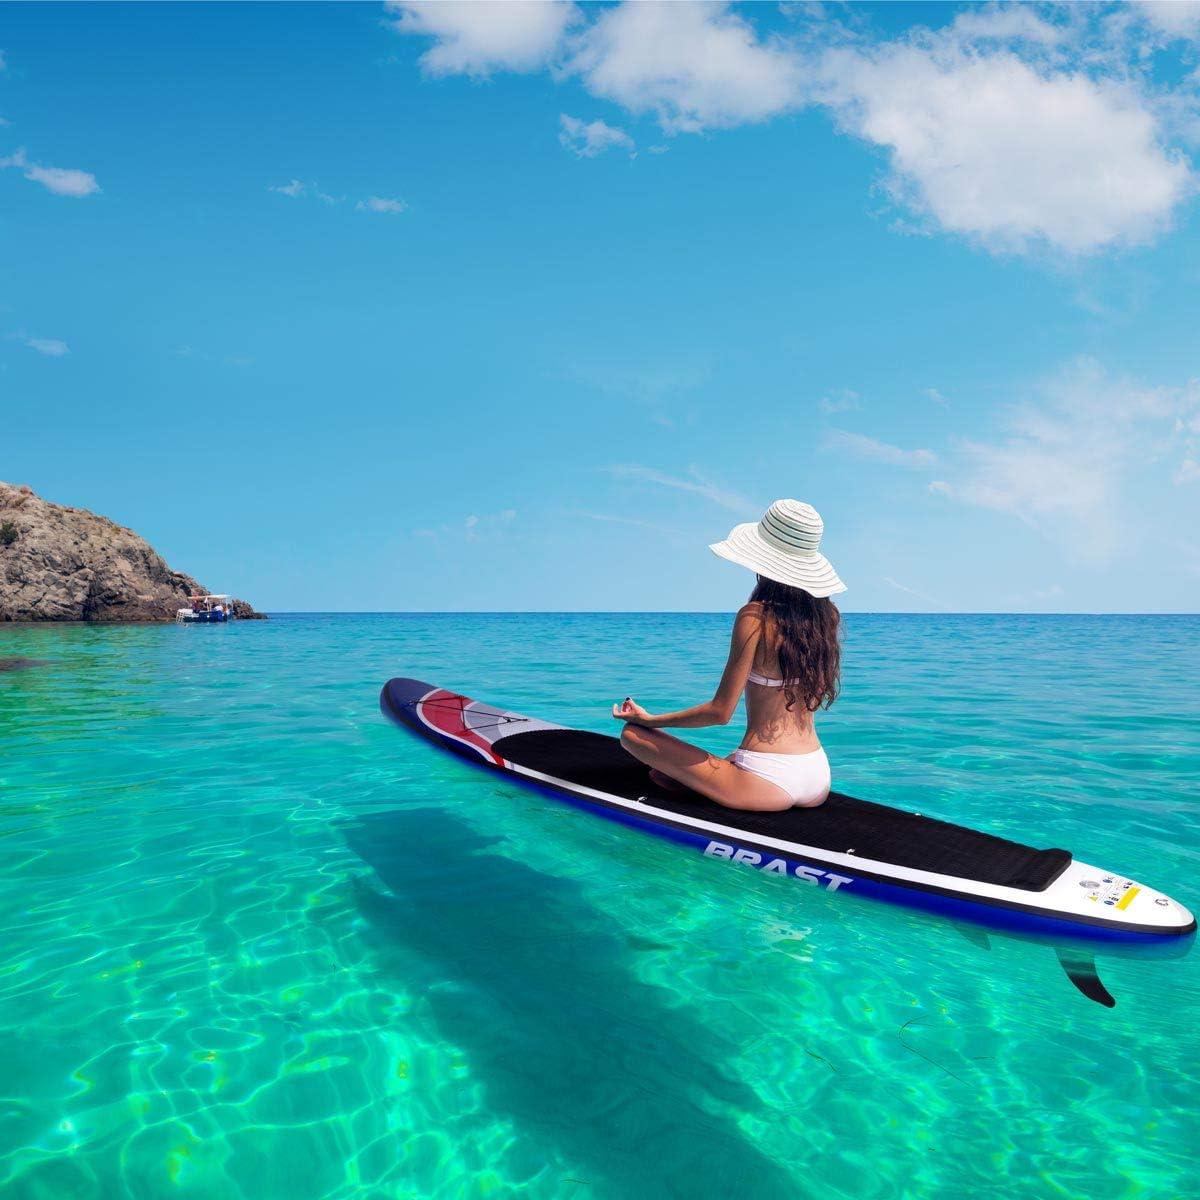 stand-up-paddling-board-brast